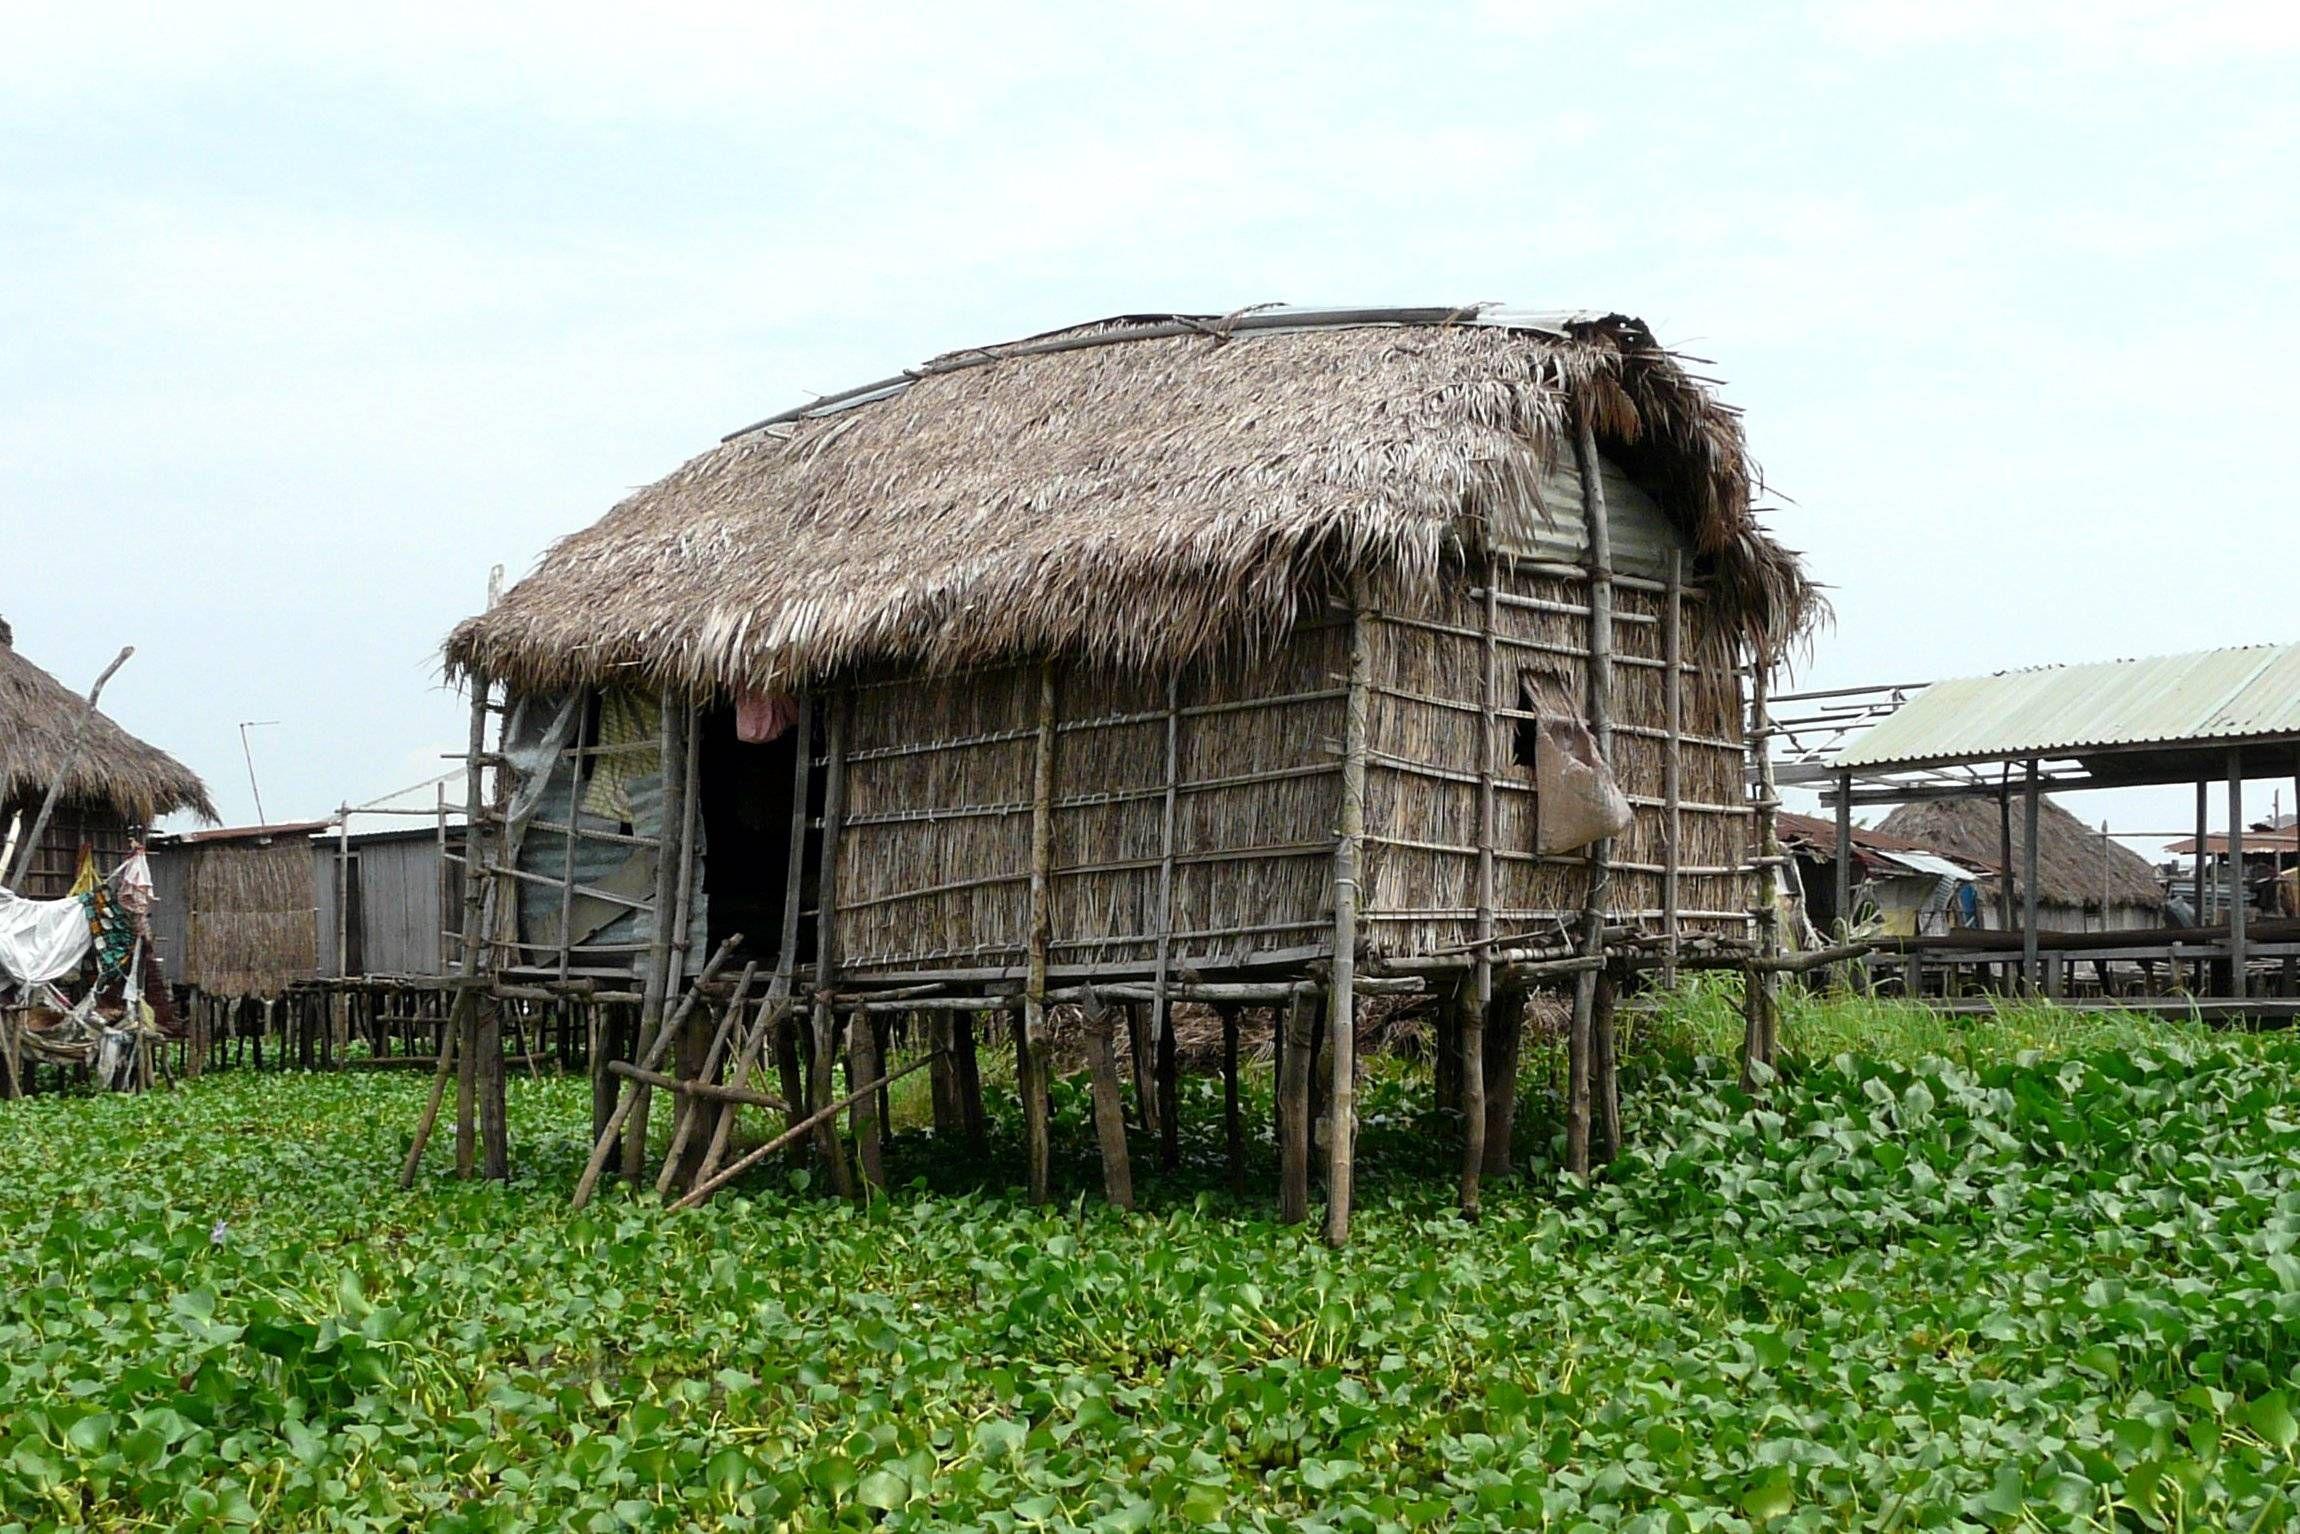 Hut In The Wilds Of Benin Africa